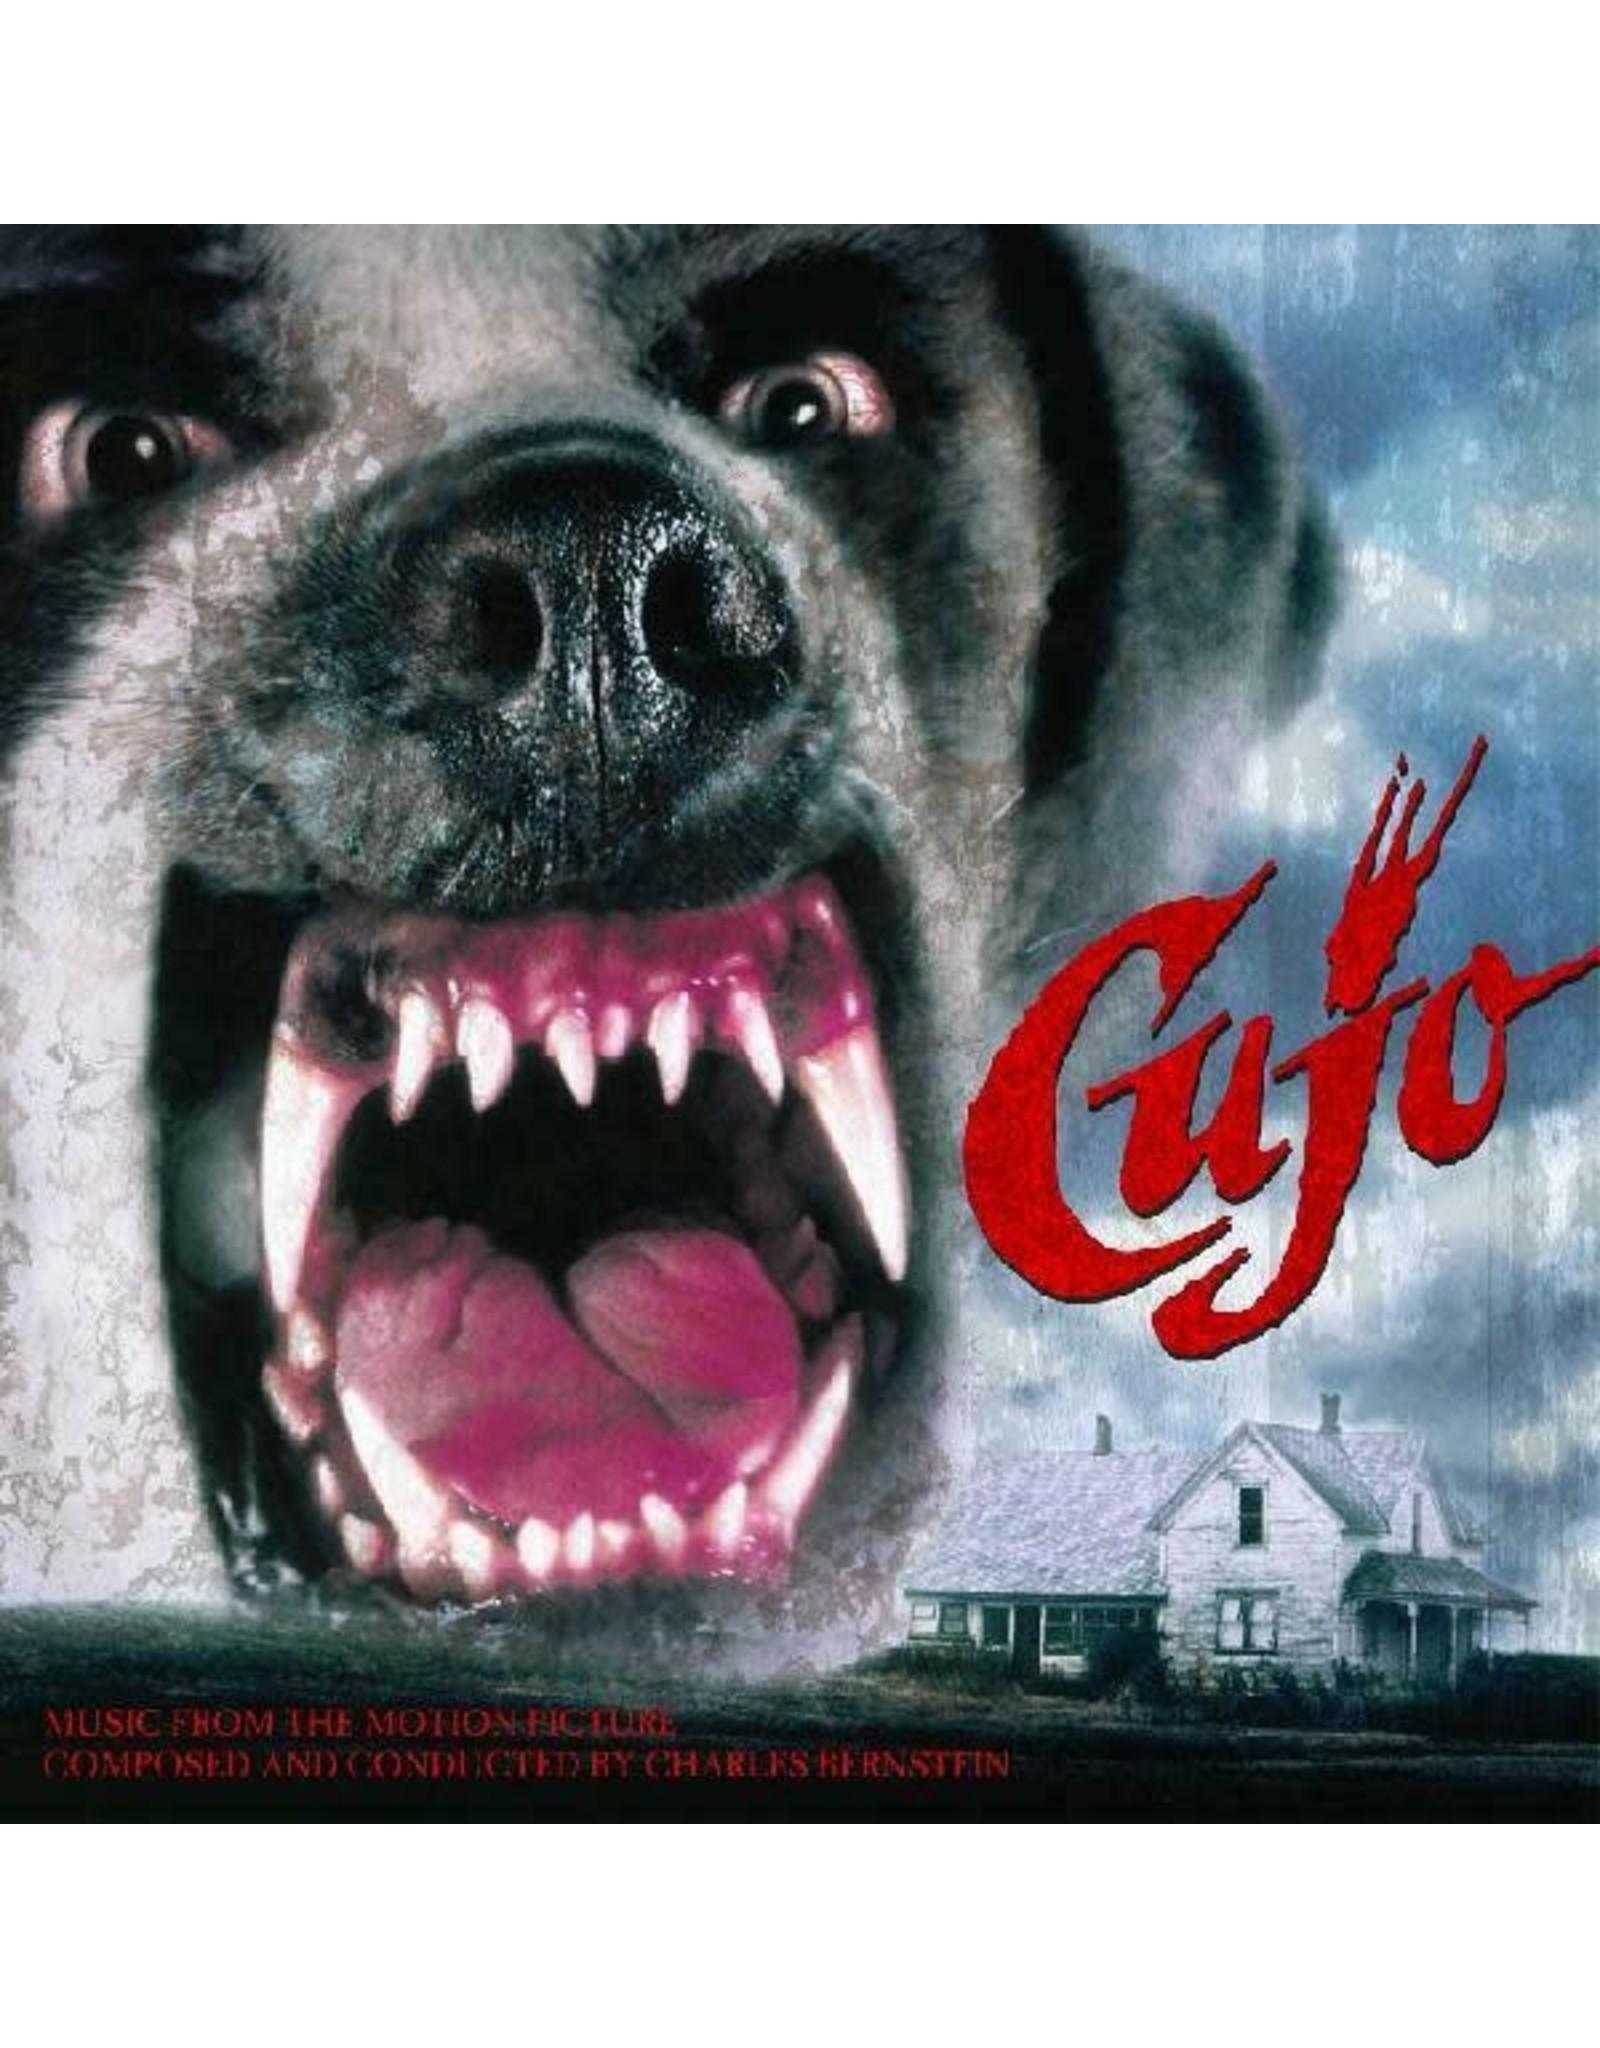 New Vinyl Charles  Bernstein - Cujo OST (Colored) LP